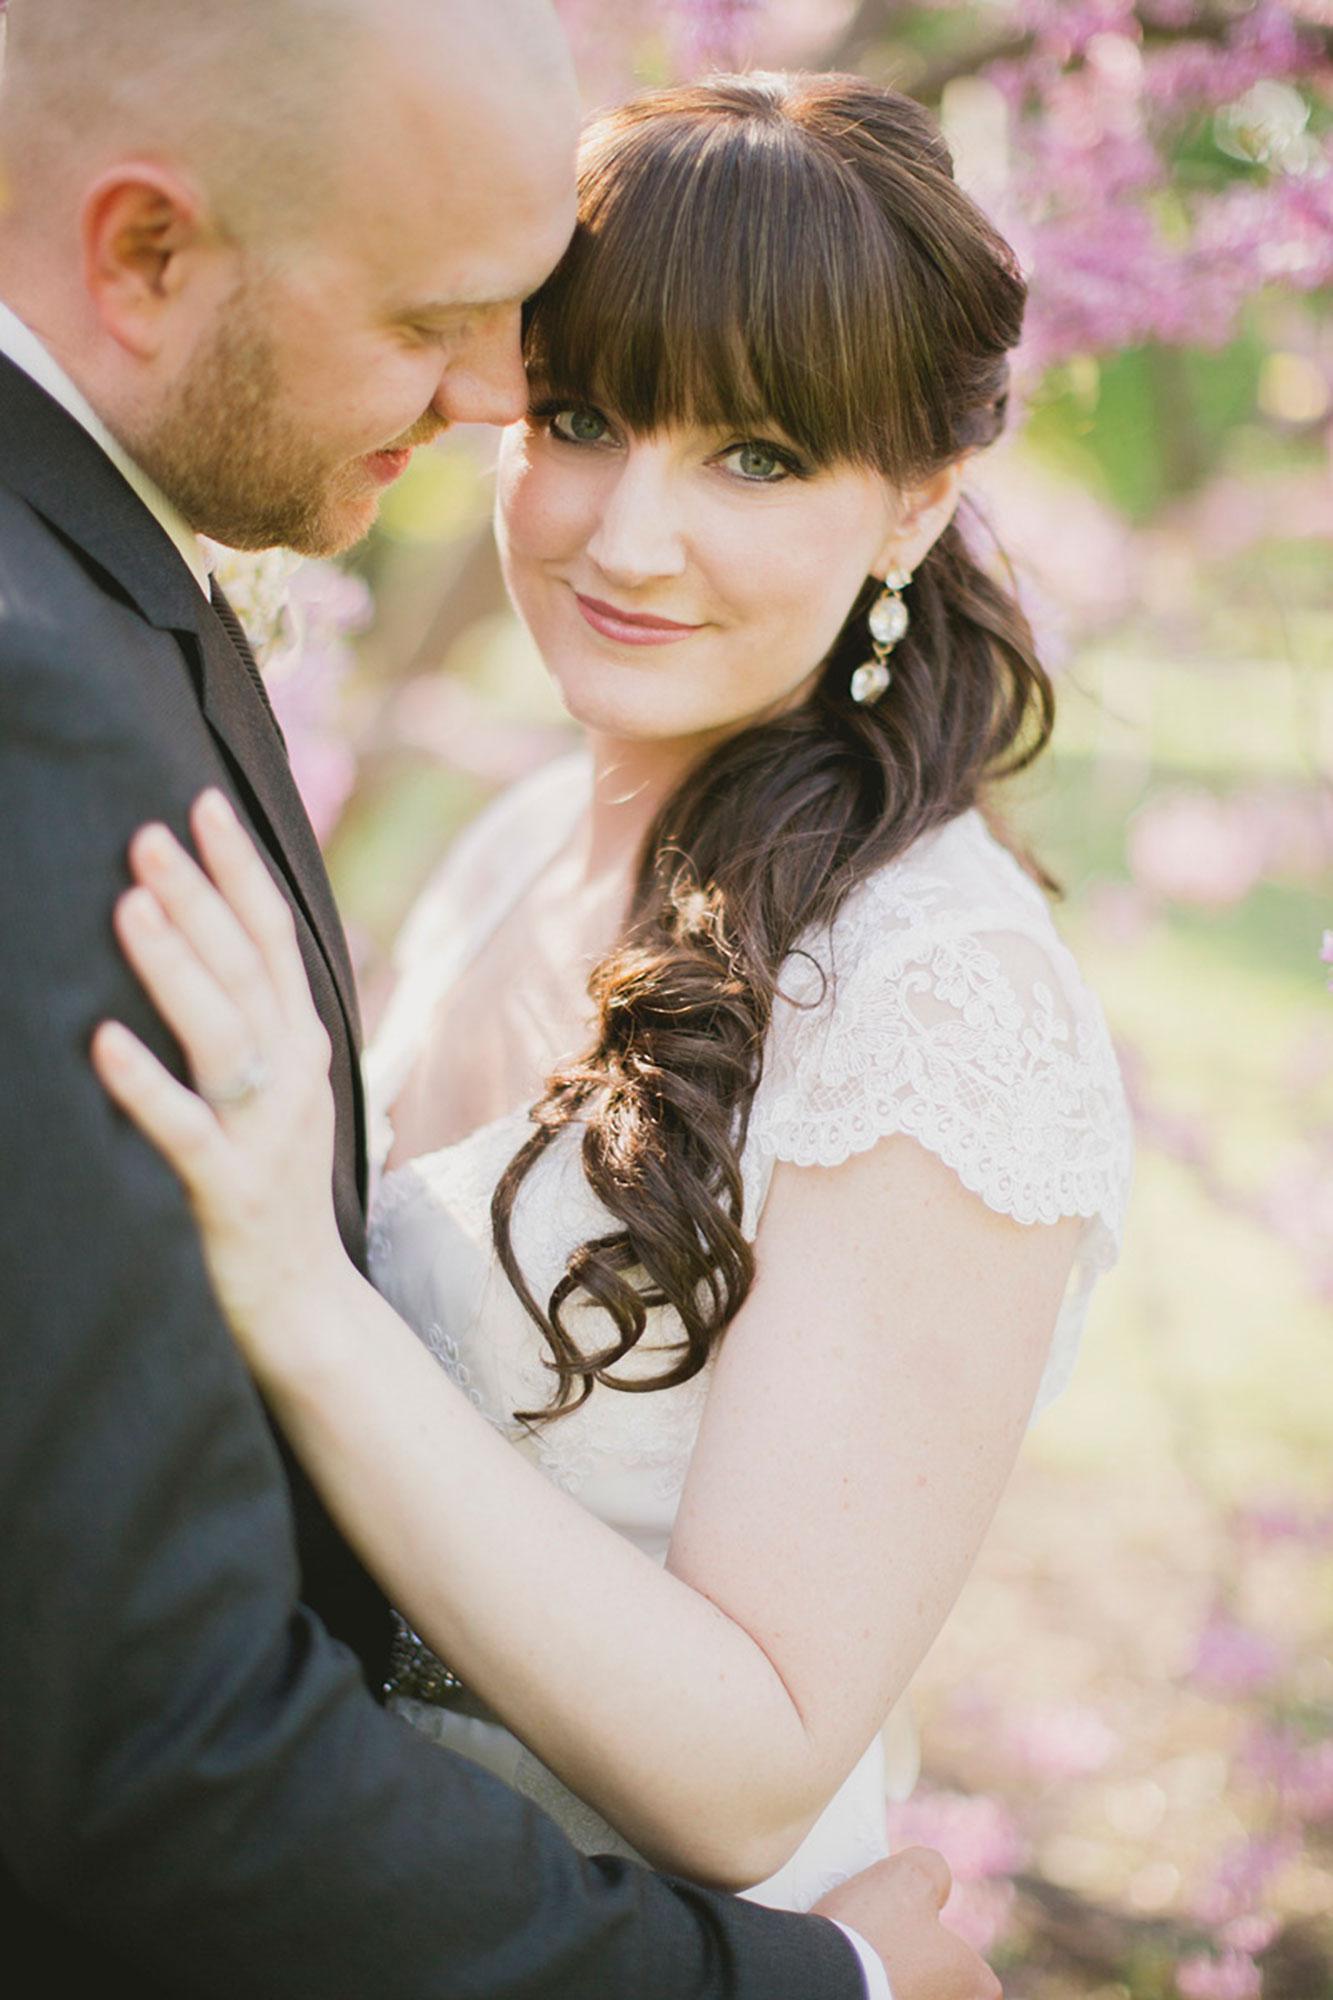 Balls-Falls-Vineyard-Bride-Photo-By-Elizabeth-in-Love-021.jpg